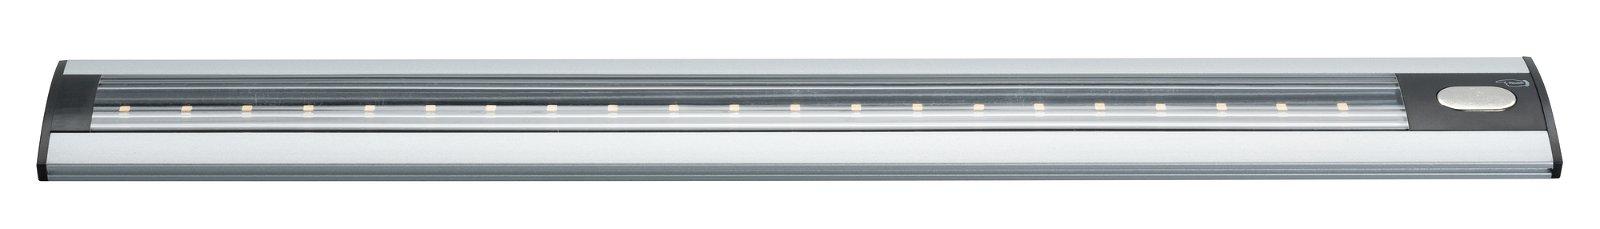 LED Schrankleuchte TriX inkl. Sensor 465x65mm 500lm 230/12V 3000K Alu matt/Schwarz